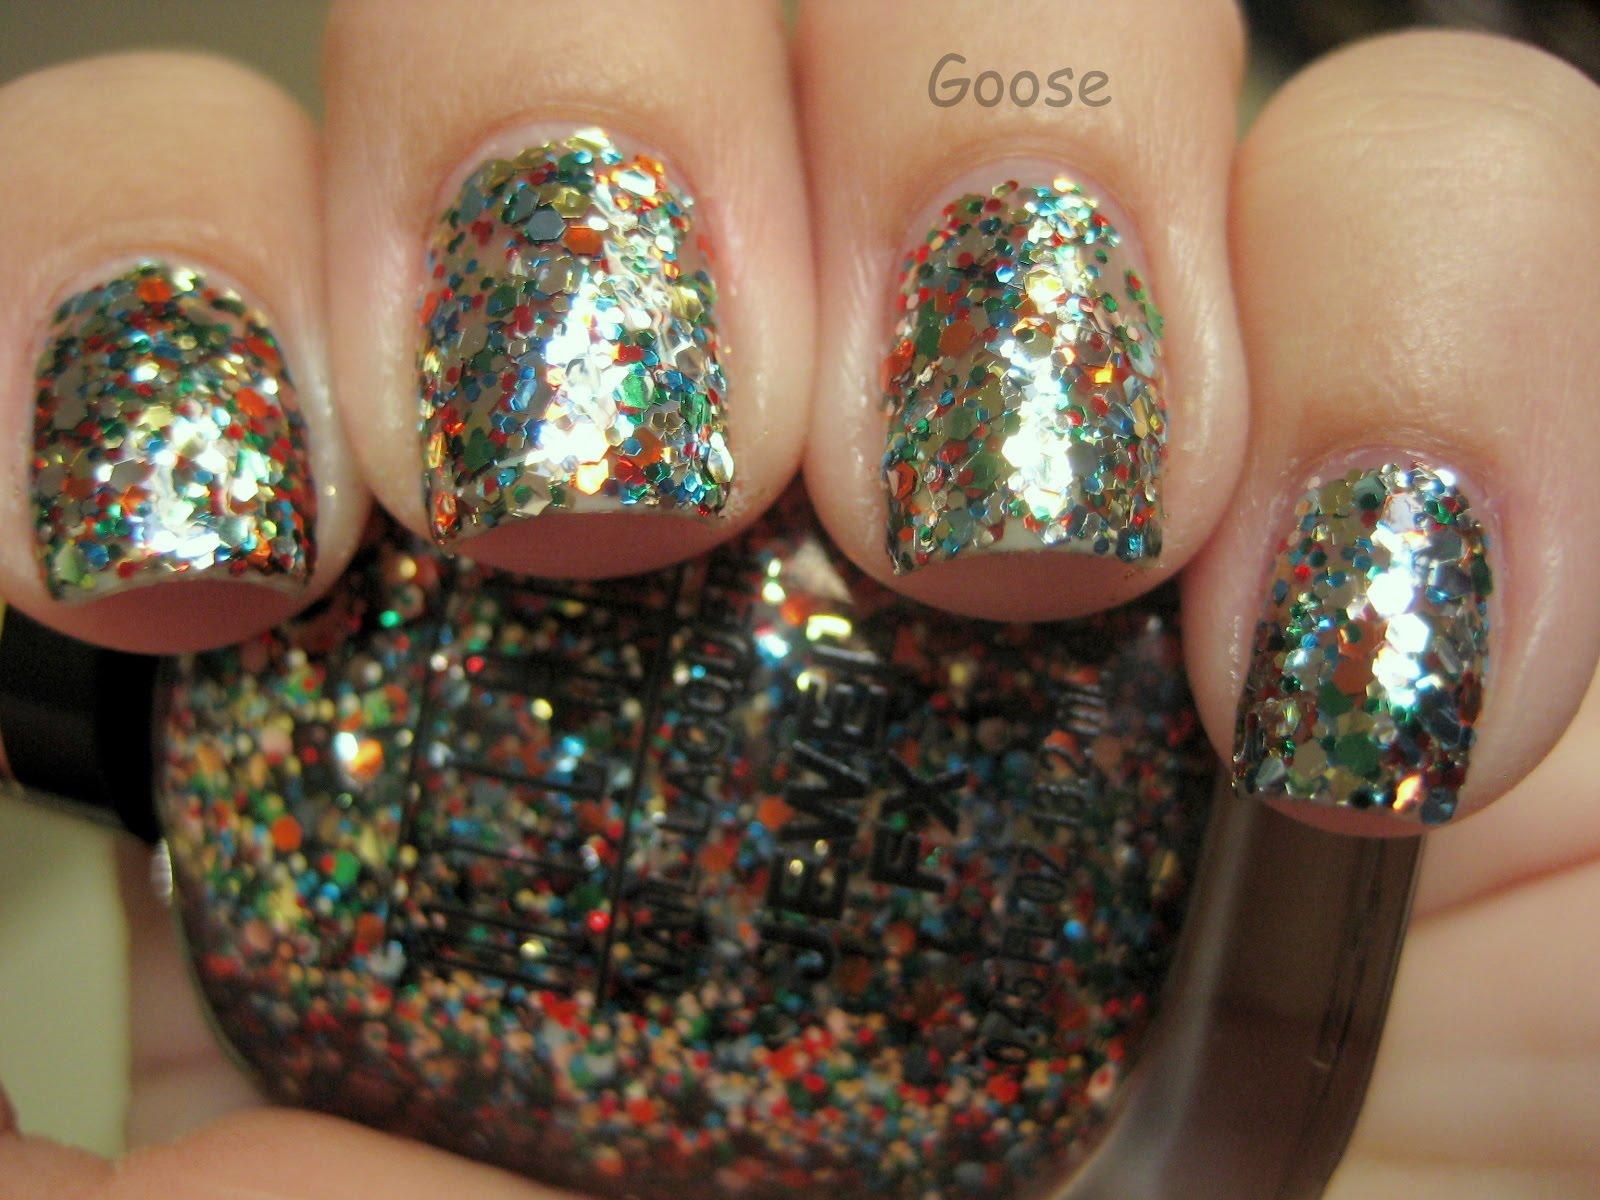 Goose's Glitter: Milani Jewel FX Re-swatches